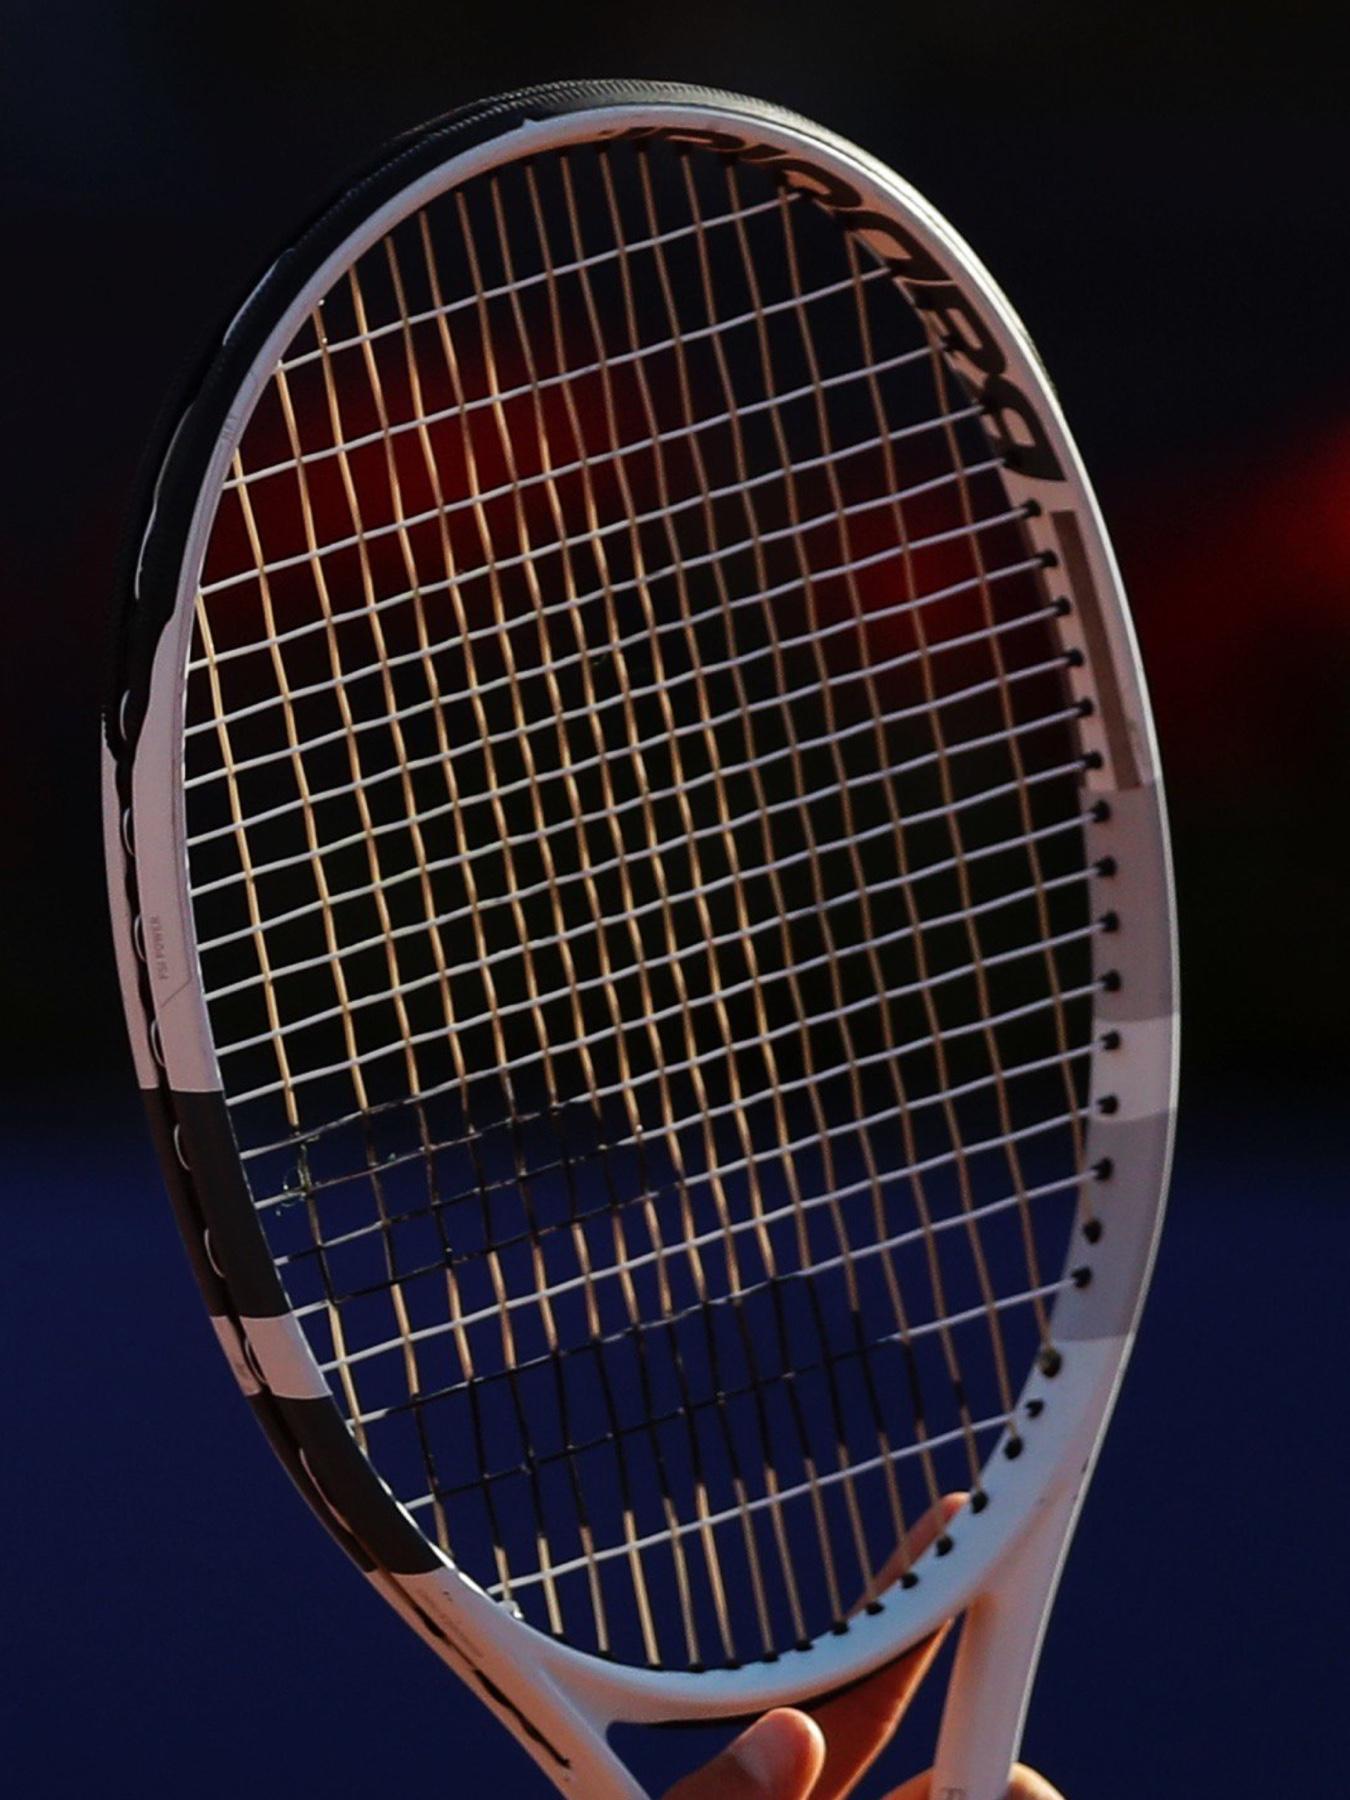 Dominic Thiem S New Strings At Indian Wells Talk Tennis